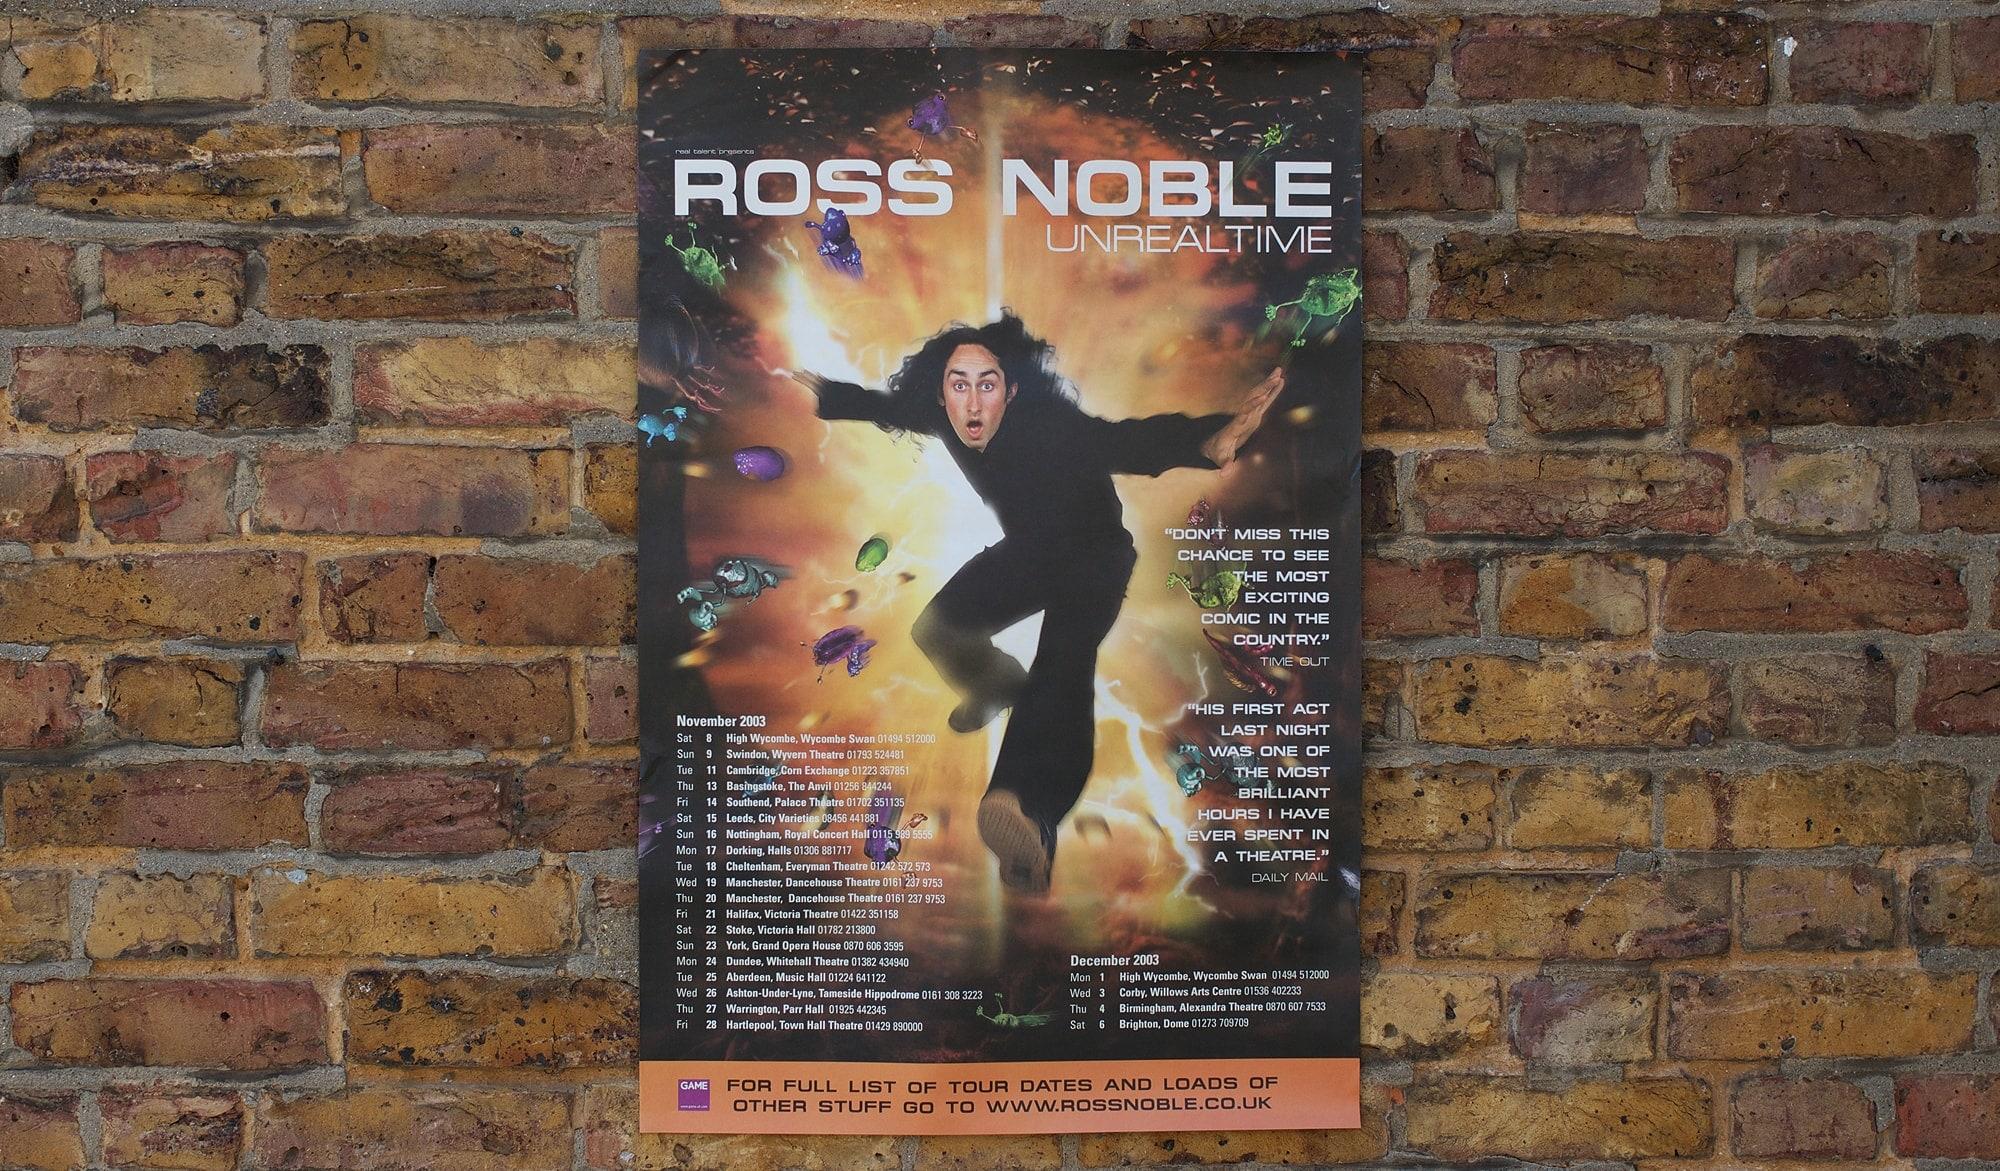 Ross noble poster